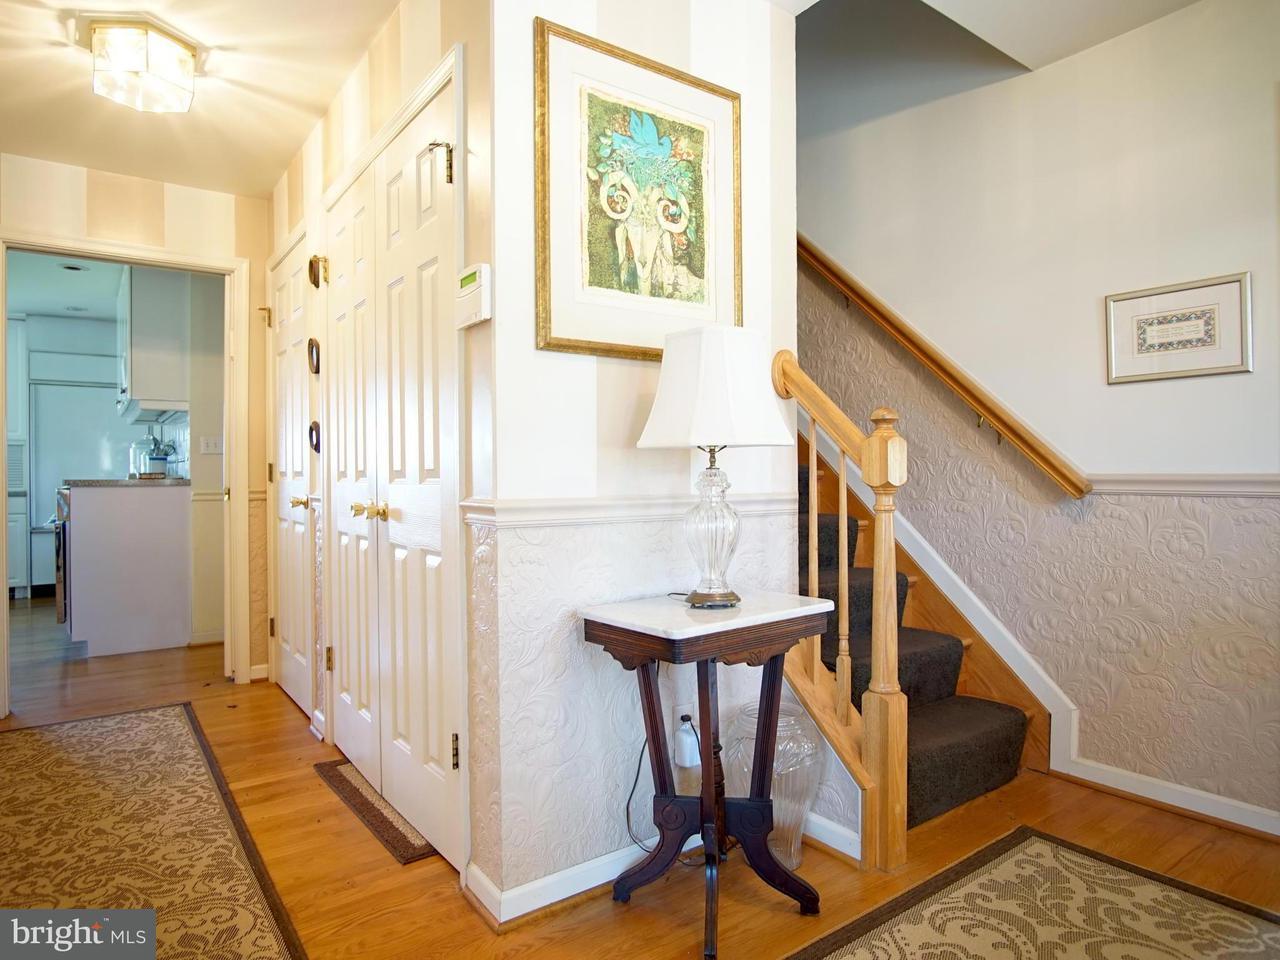 Luxury Real Estate Listings in Finksburg,, Maryland, United States ...